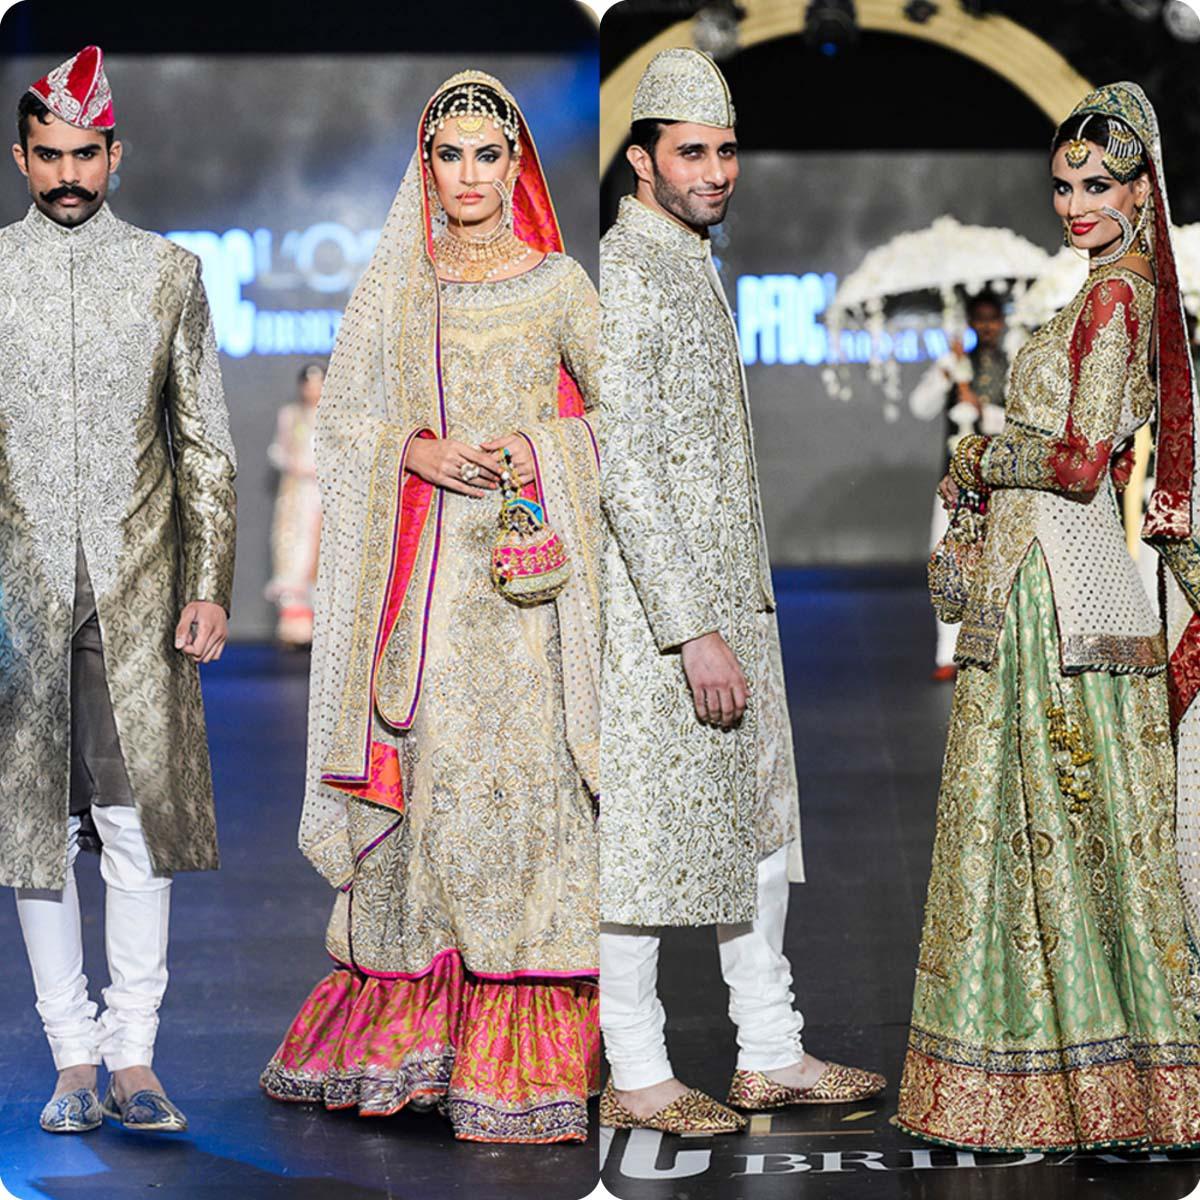 Nomi Ansari Bridal Wear Collection Ft-Junaid Khan & Maya Ali 2016-17 (10)